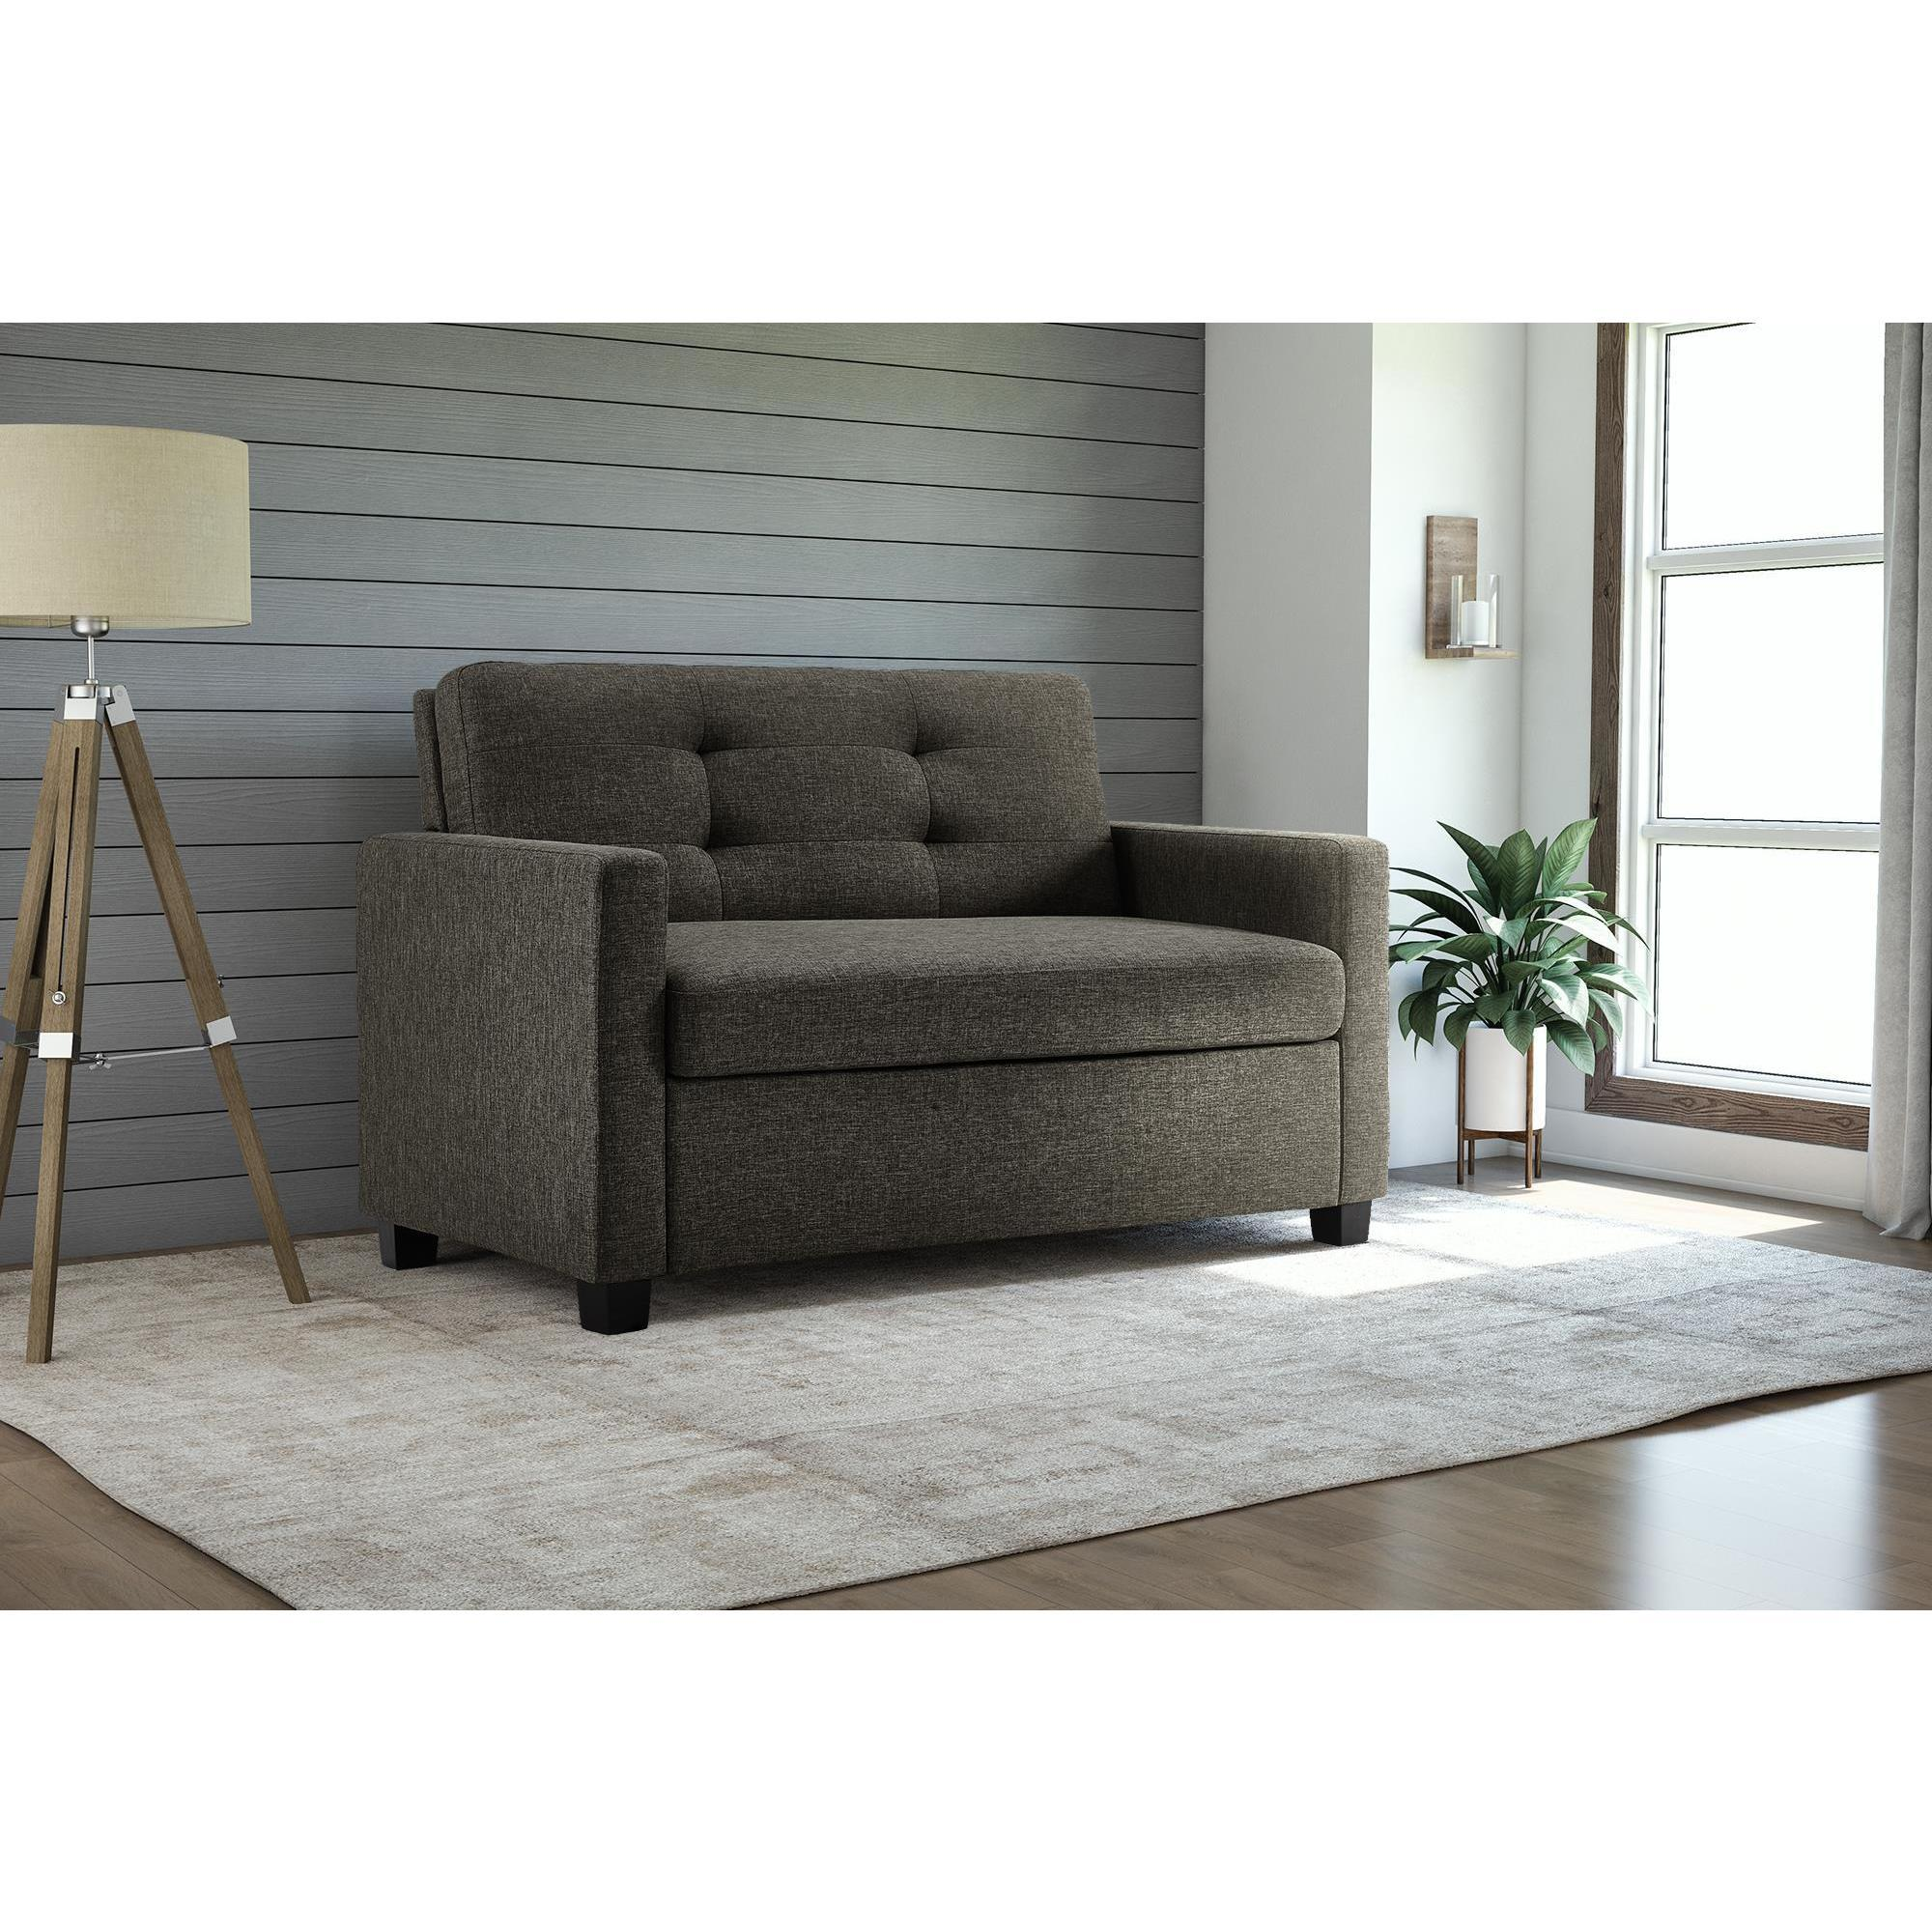 low priced 0a81d ed08d Shop DHP Signature Sleep Devon Grey Linen Twin Sleeper Sofa ...